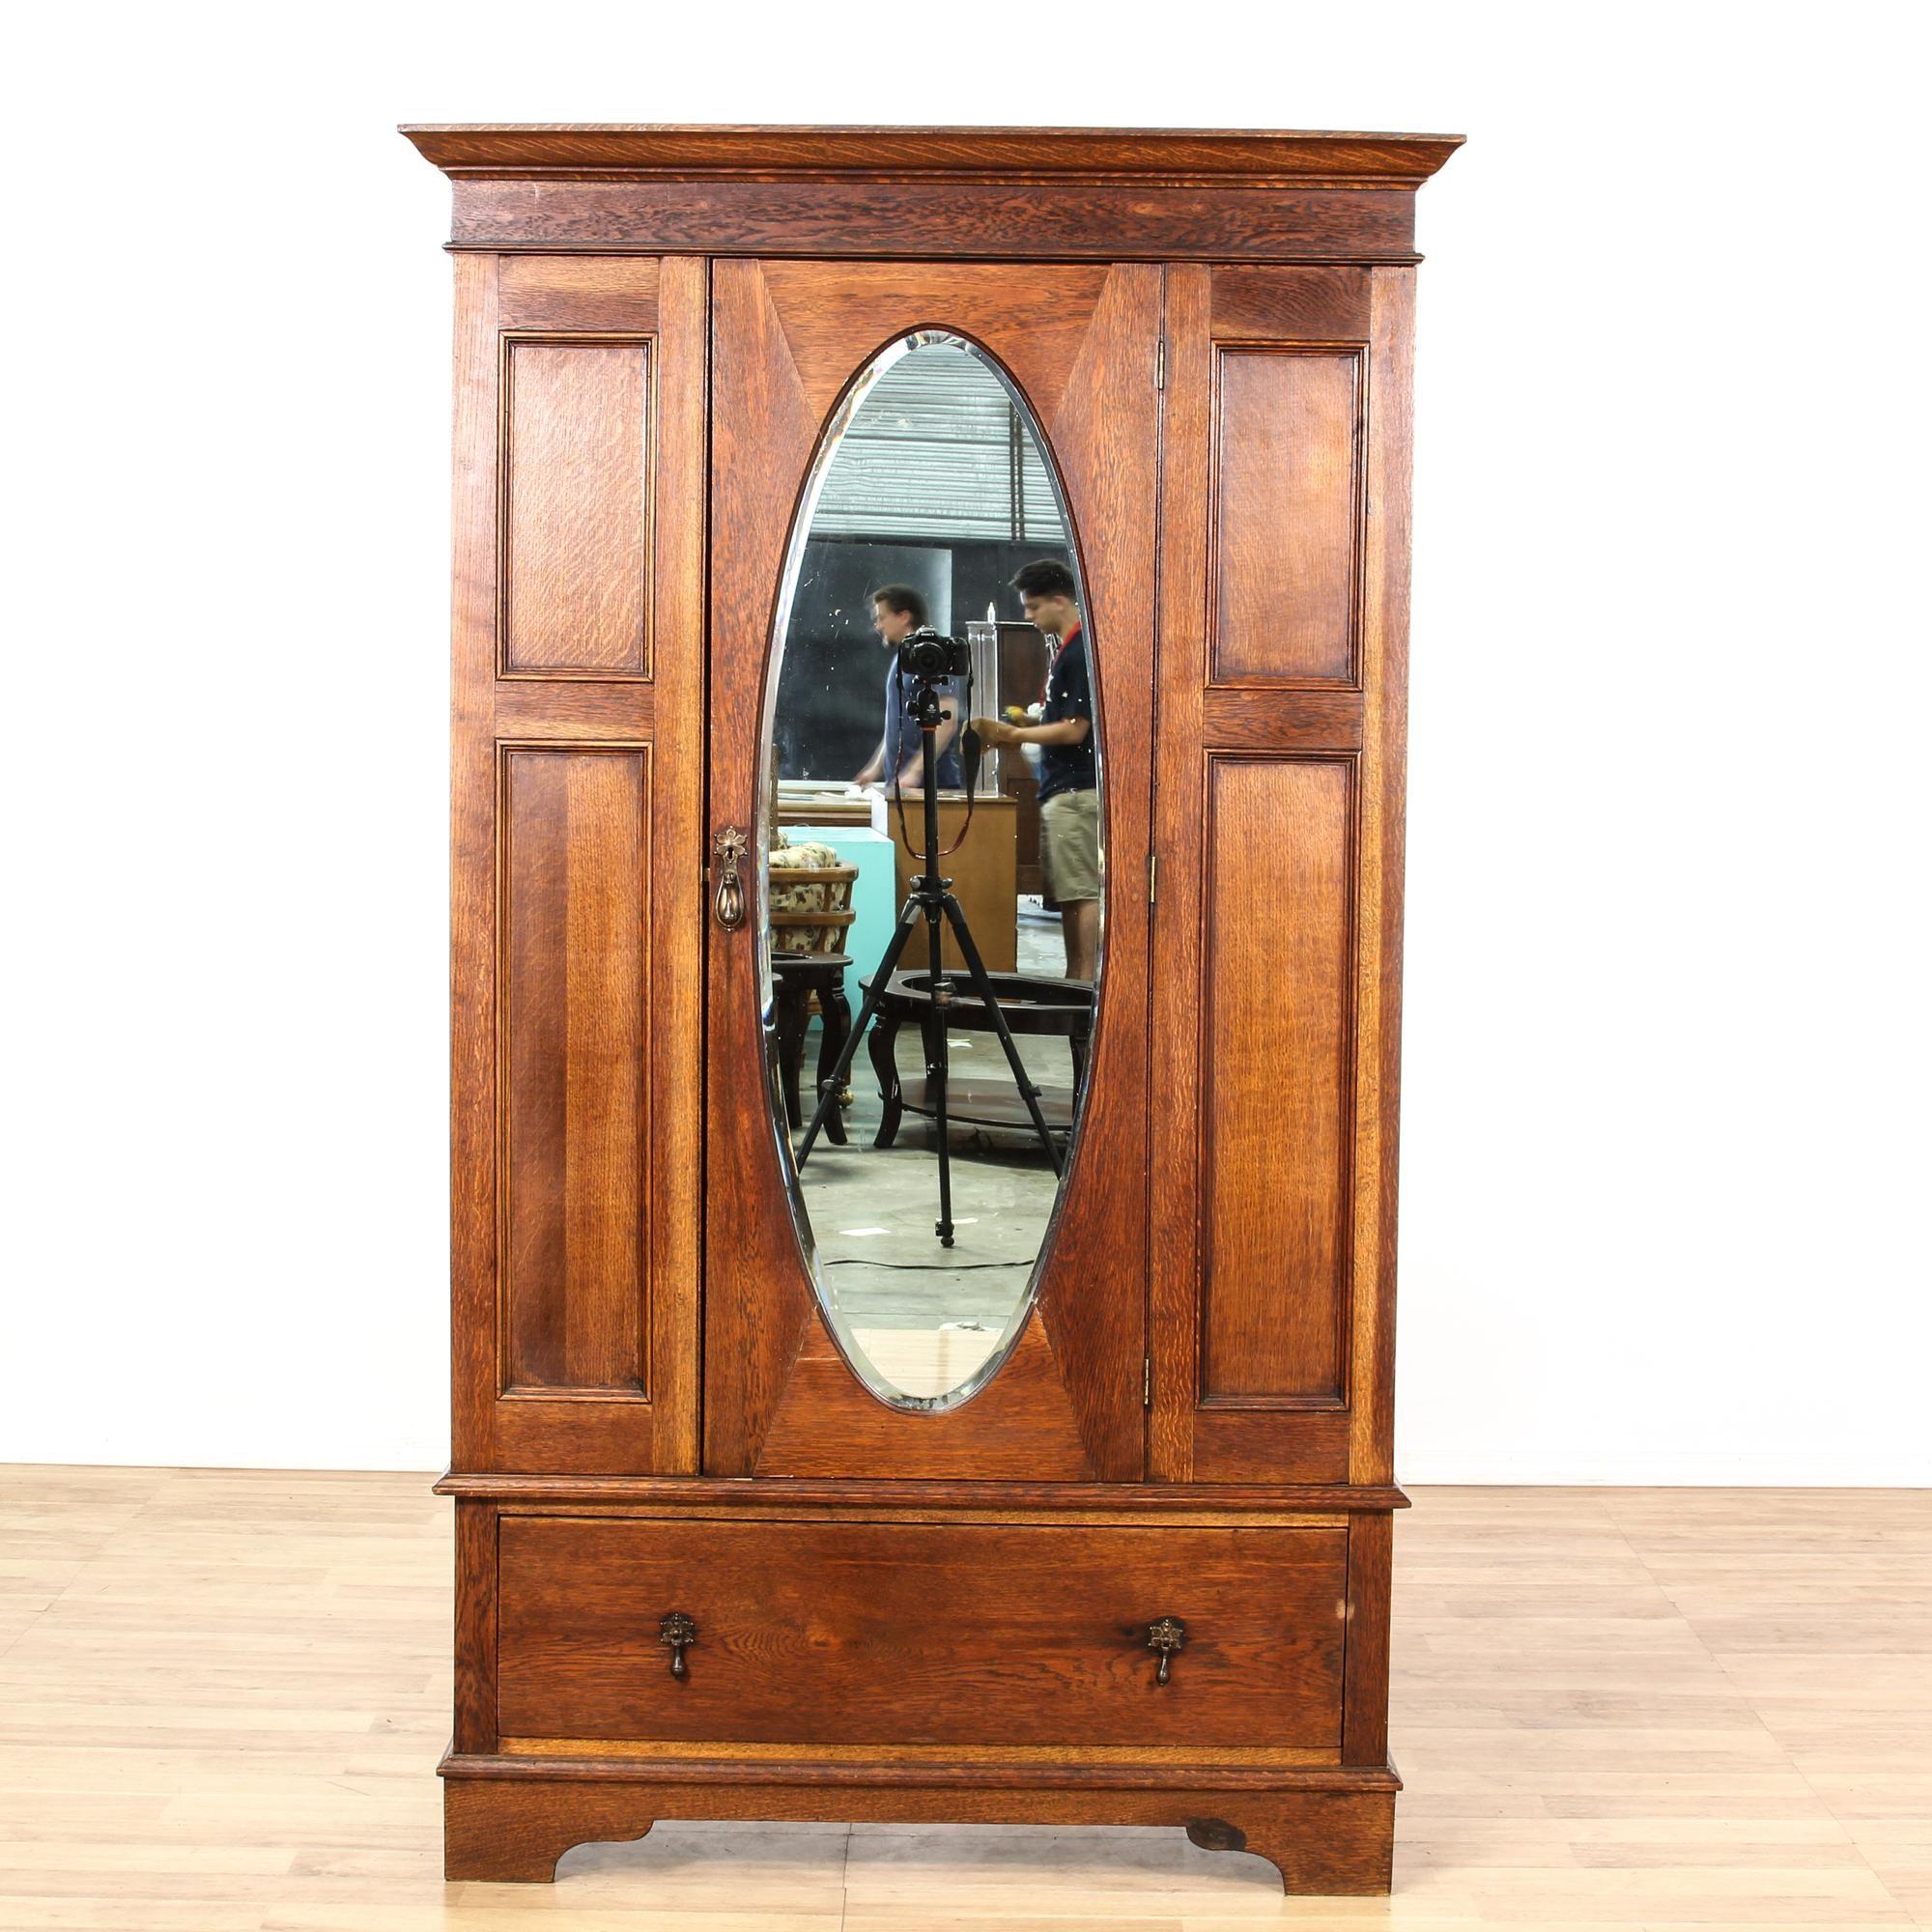 Antique oak mirror front wardrobe armoire shabby chic